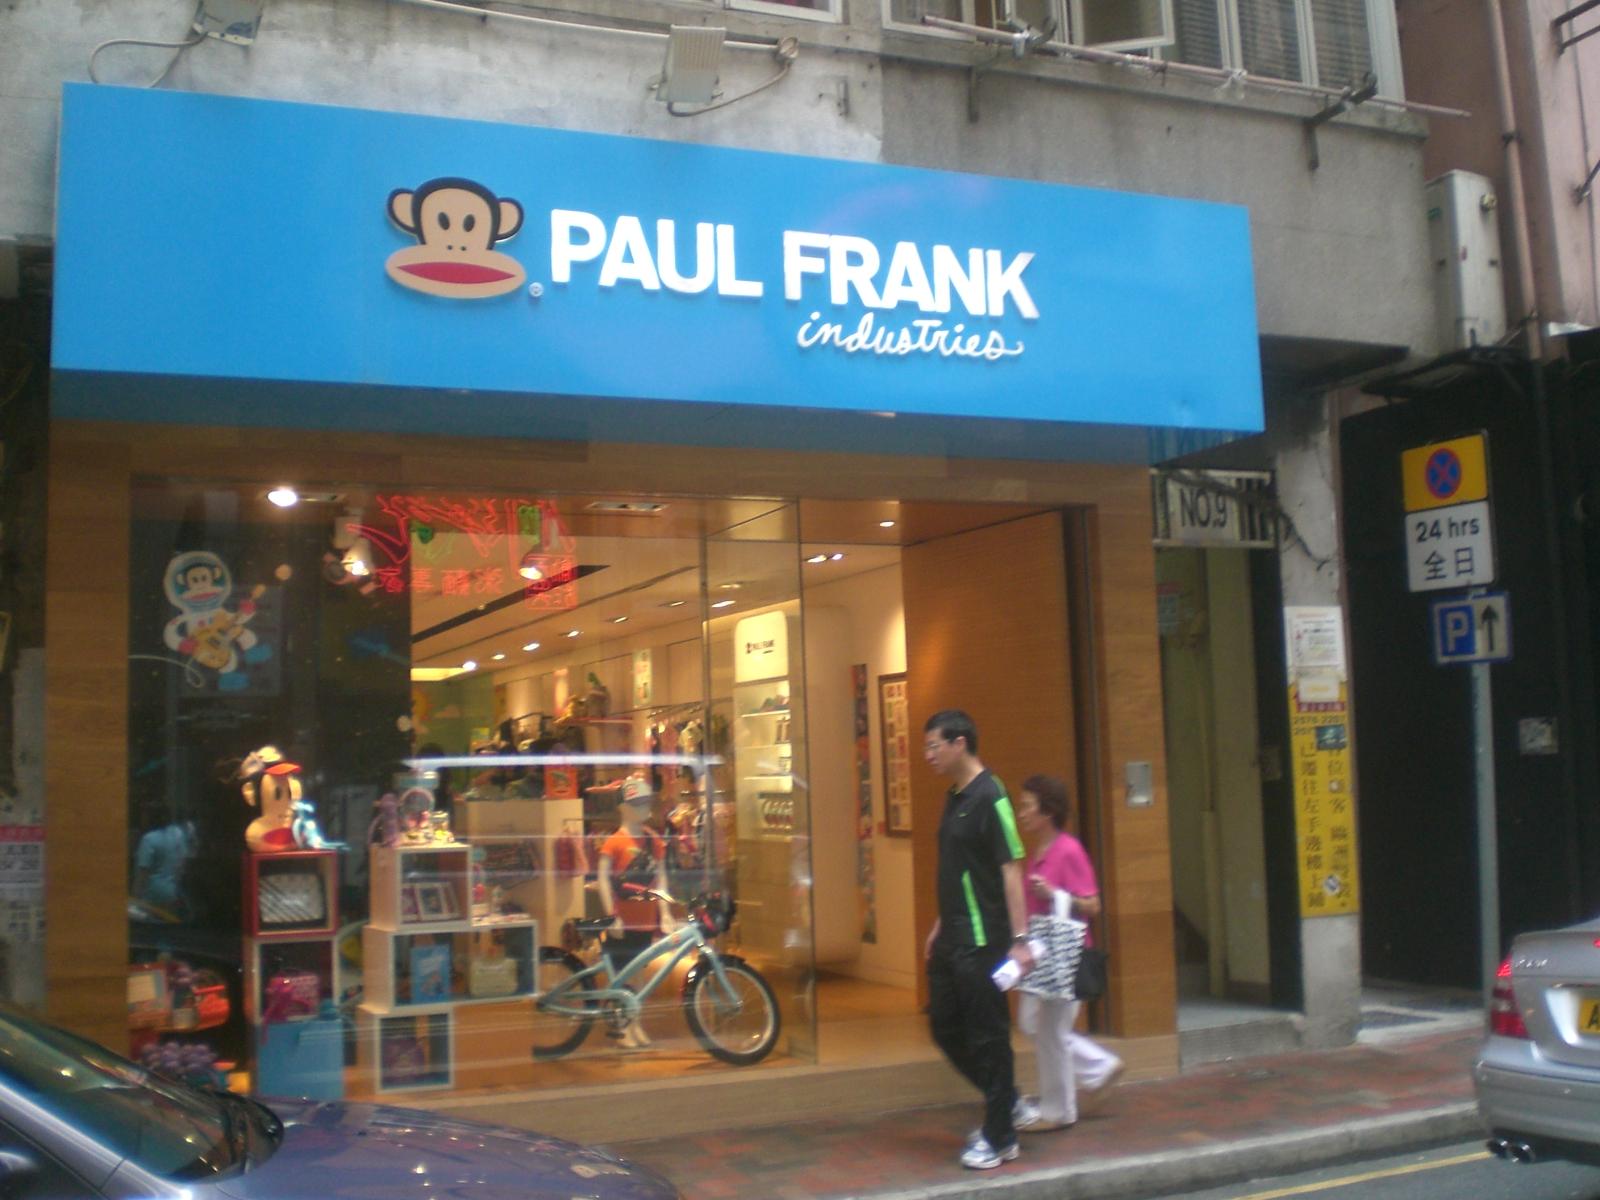 Paul Frank Industries Wikipedia 臣街 Paul Frank Industries